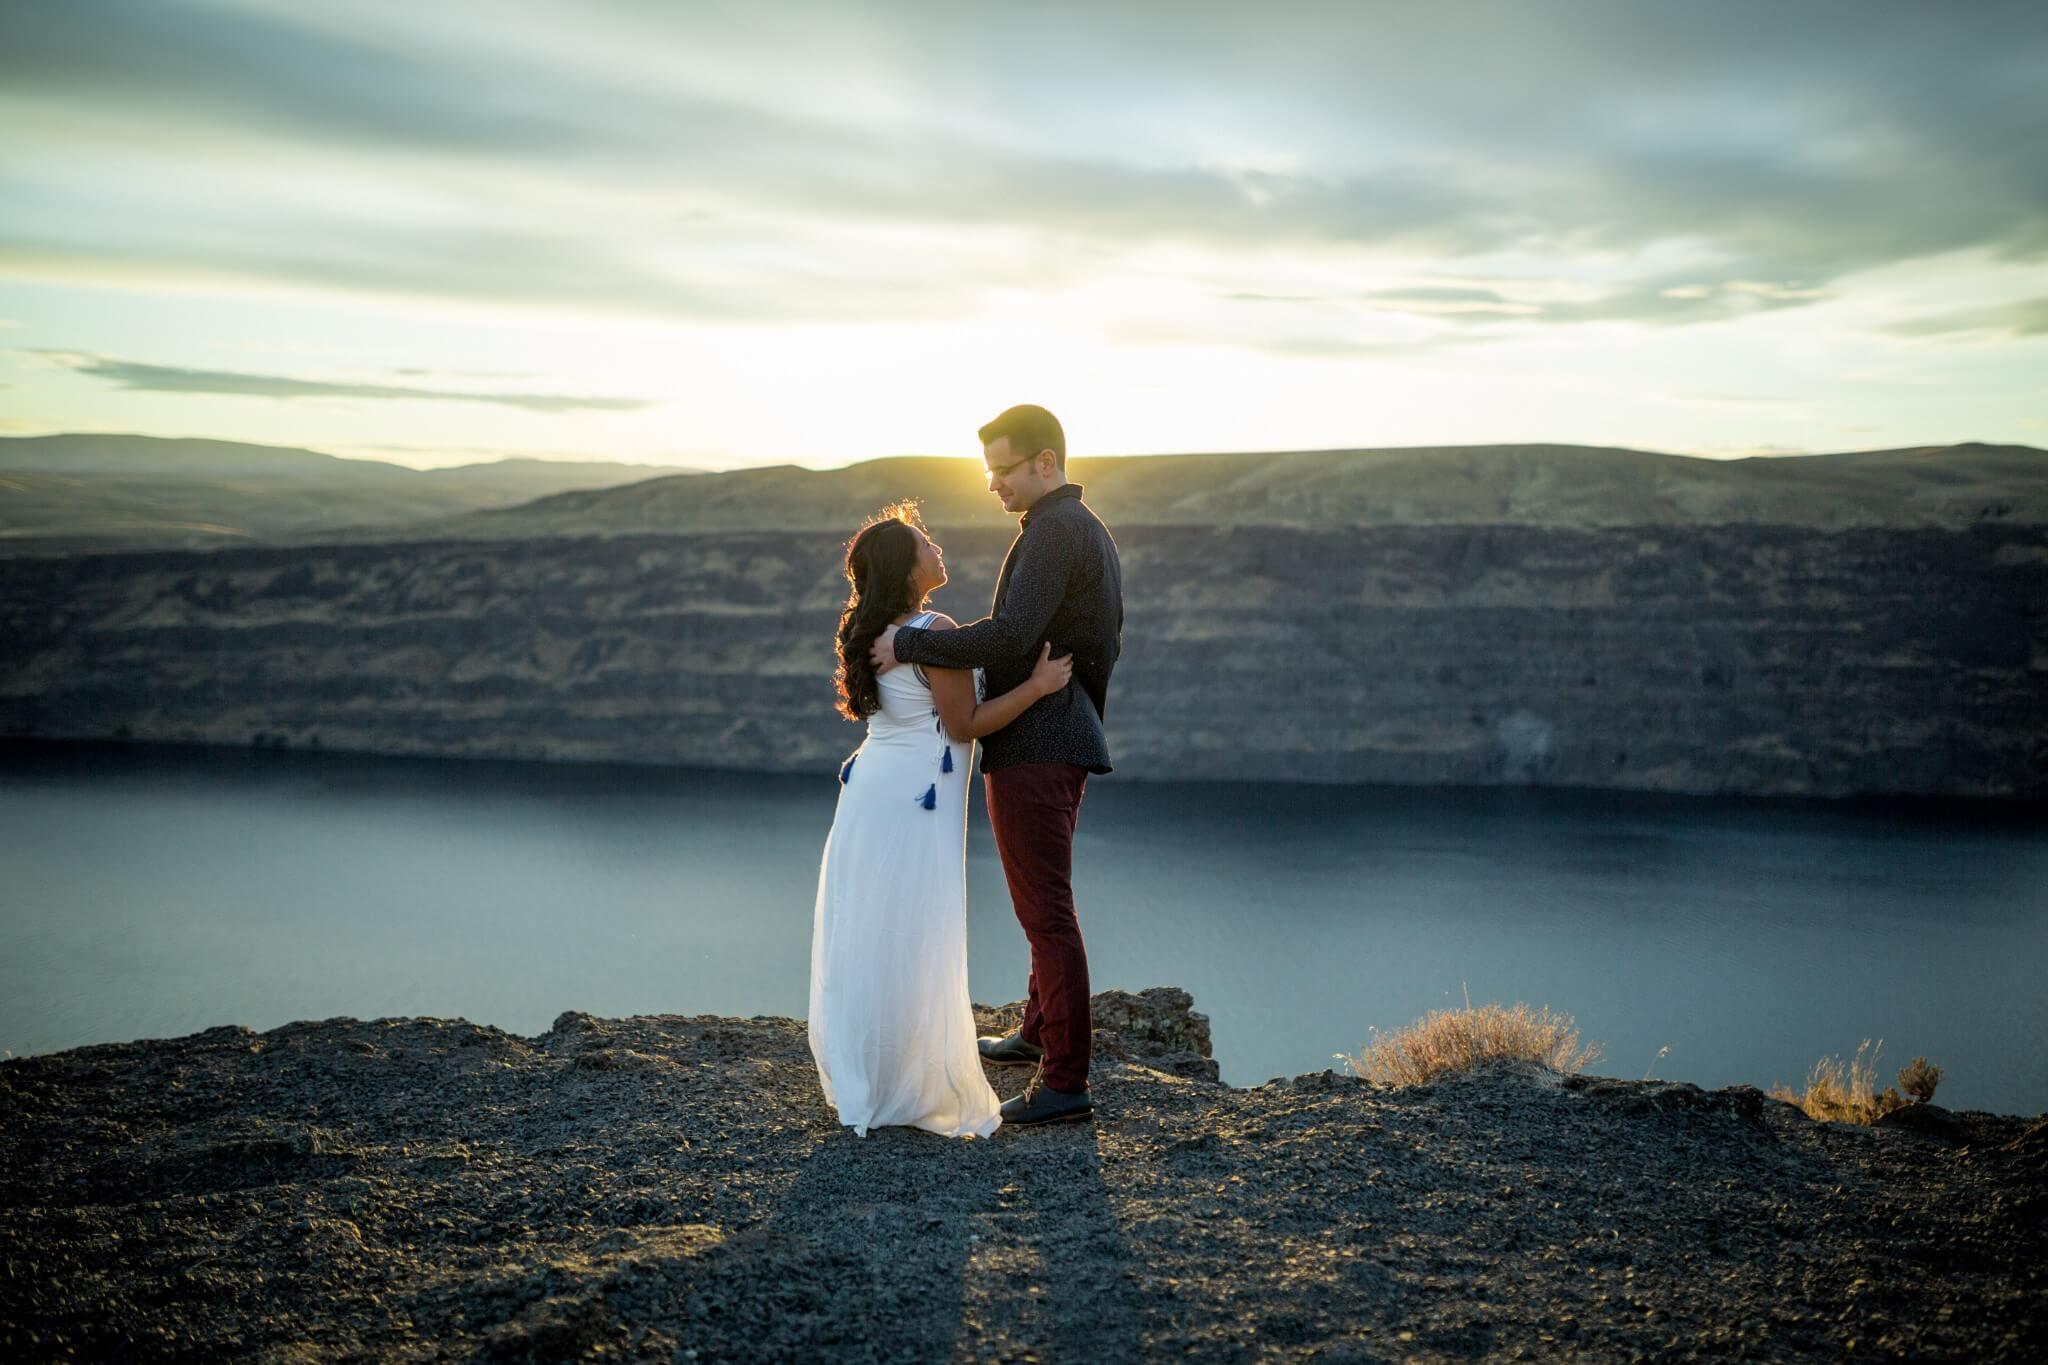 Lesly & Michael Vantage Engagement by Bill Weisgerber Spokane Photographer (55 of 71).jpg